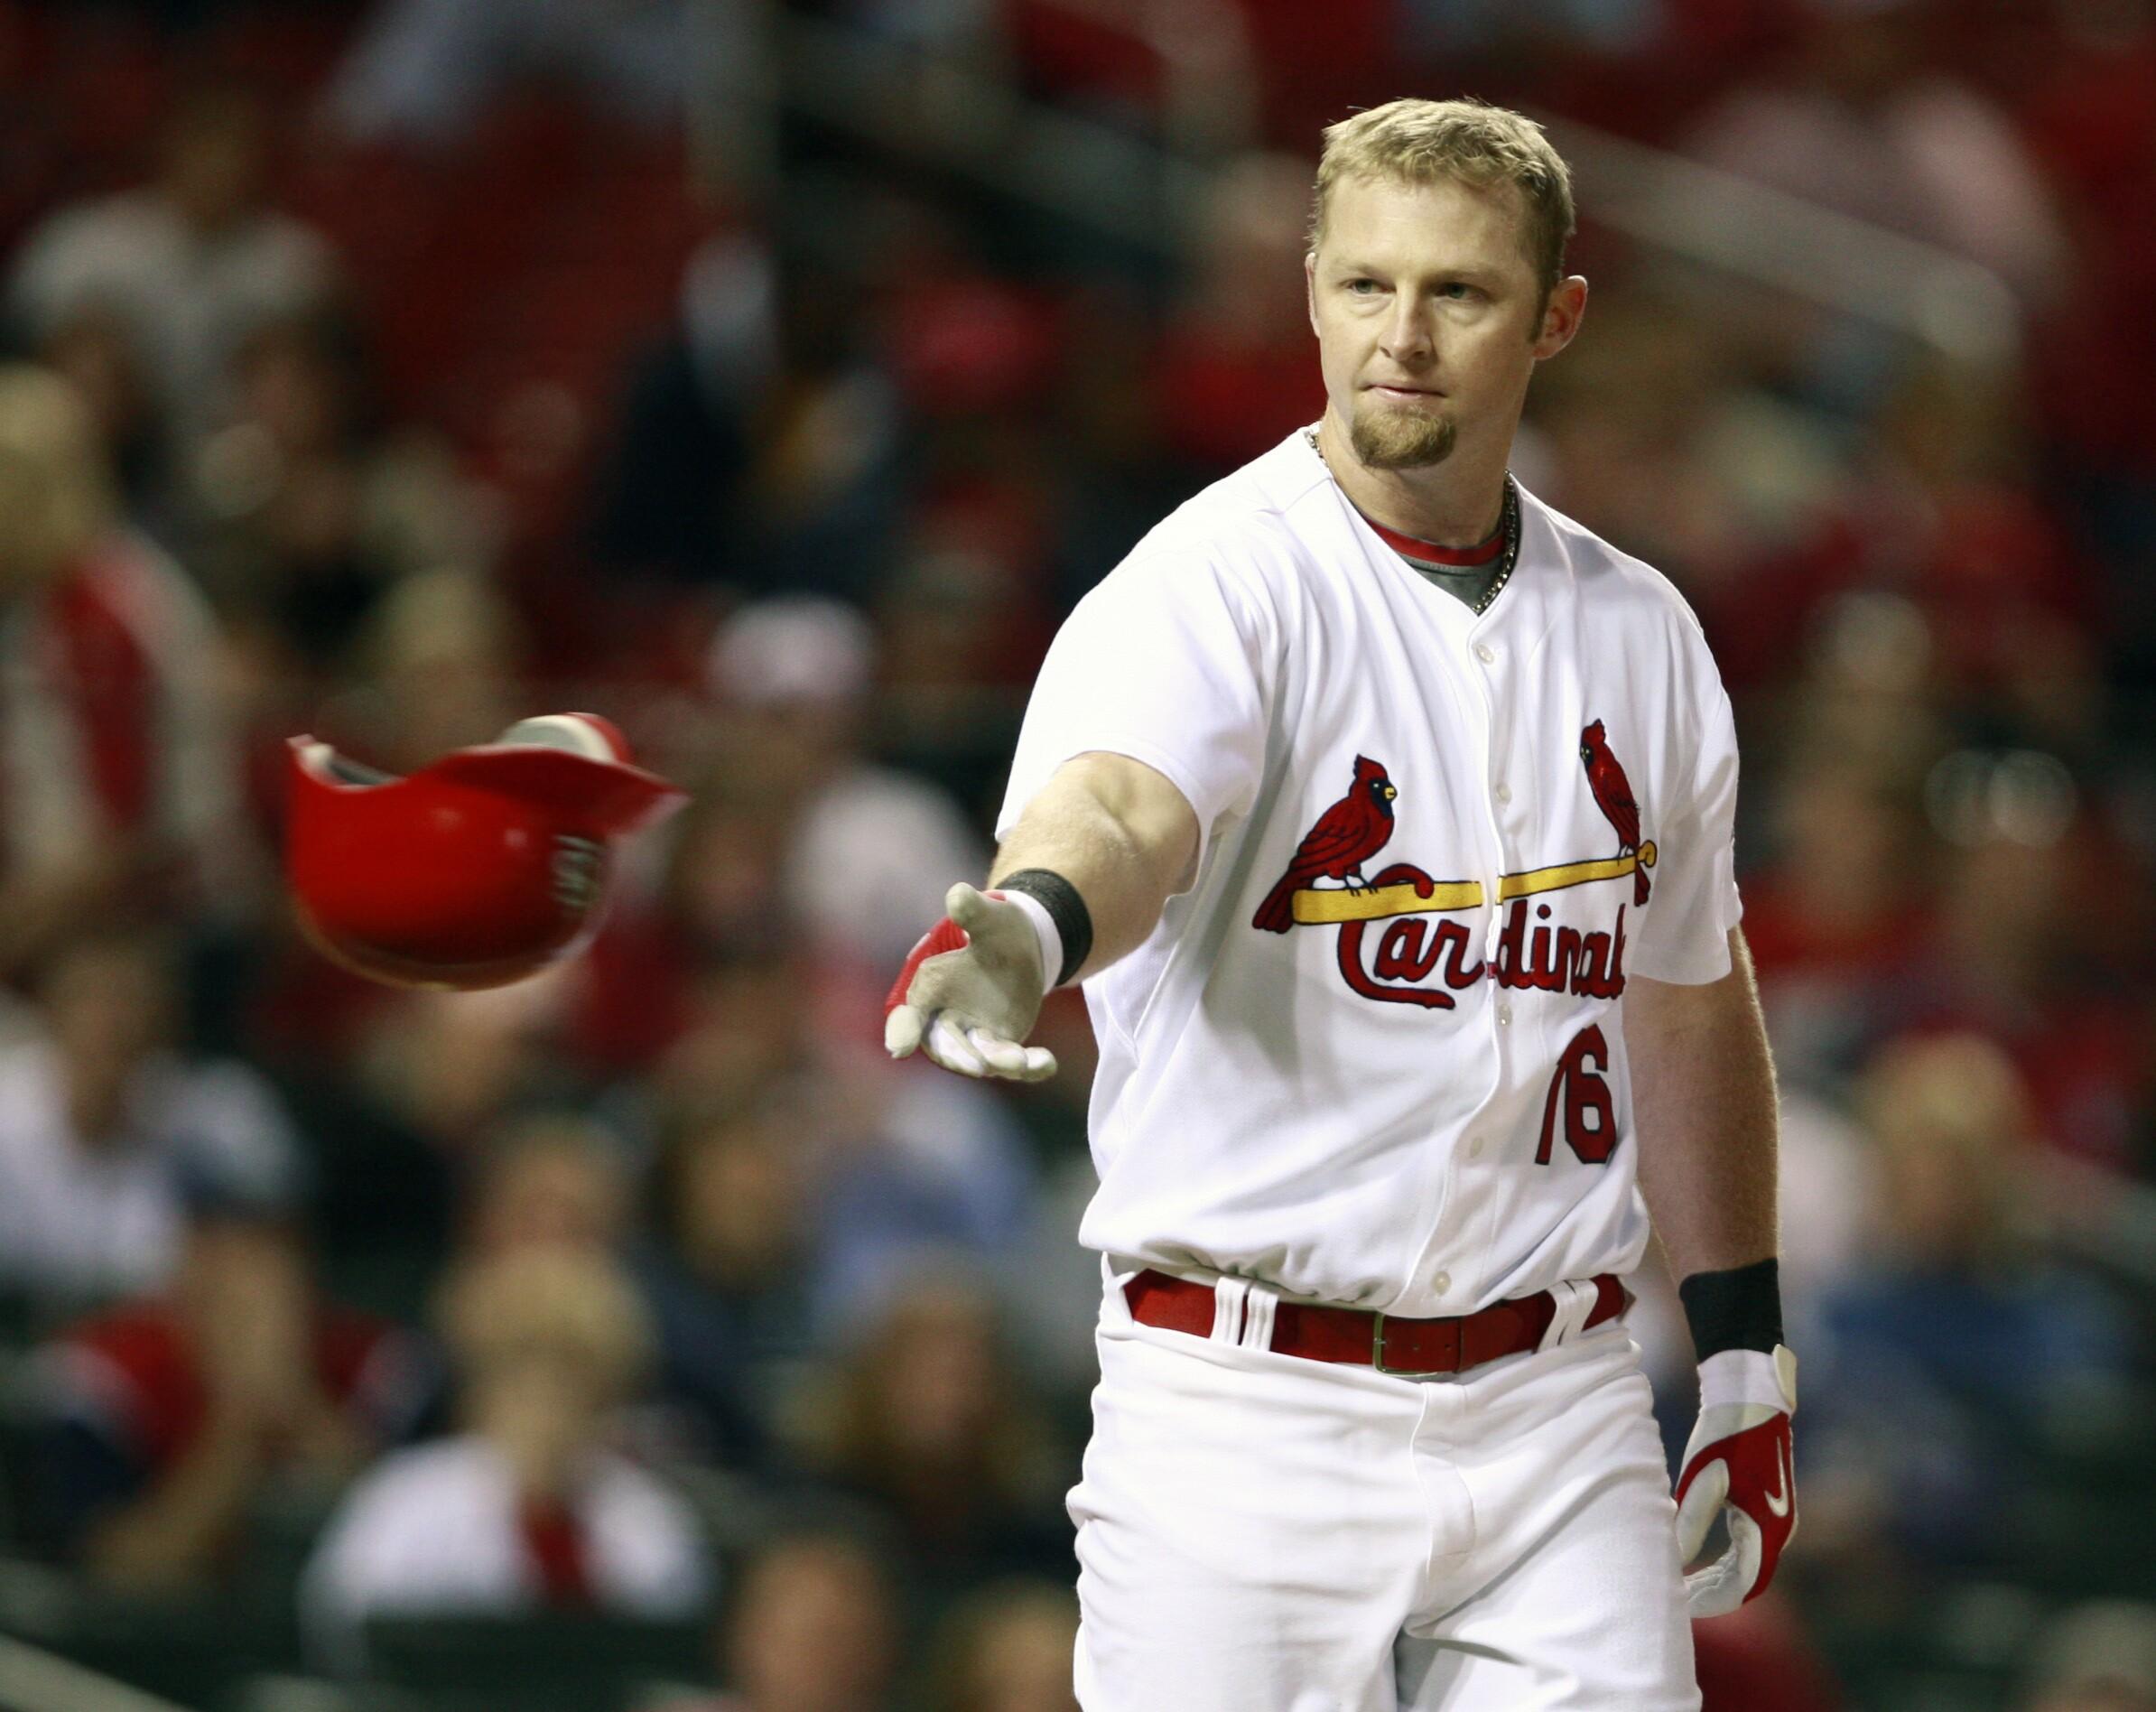 Former baseball star dead from brain cancer at 38